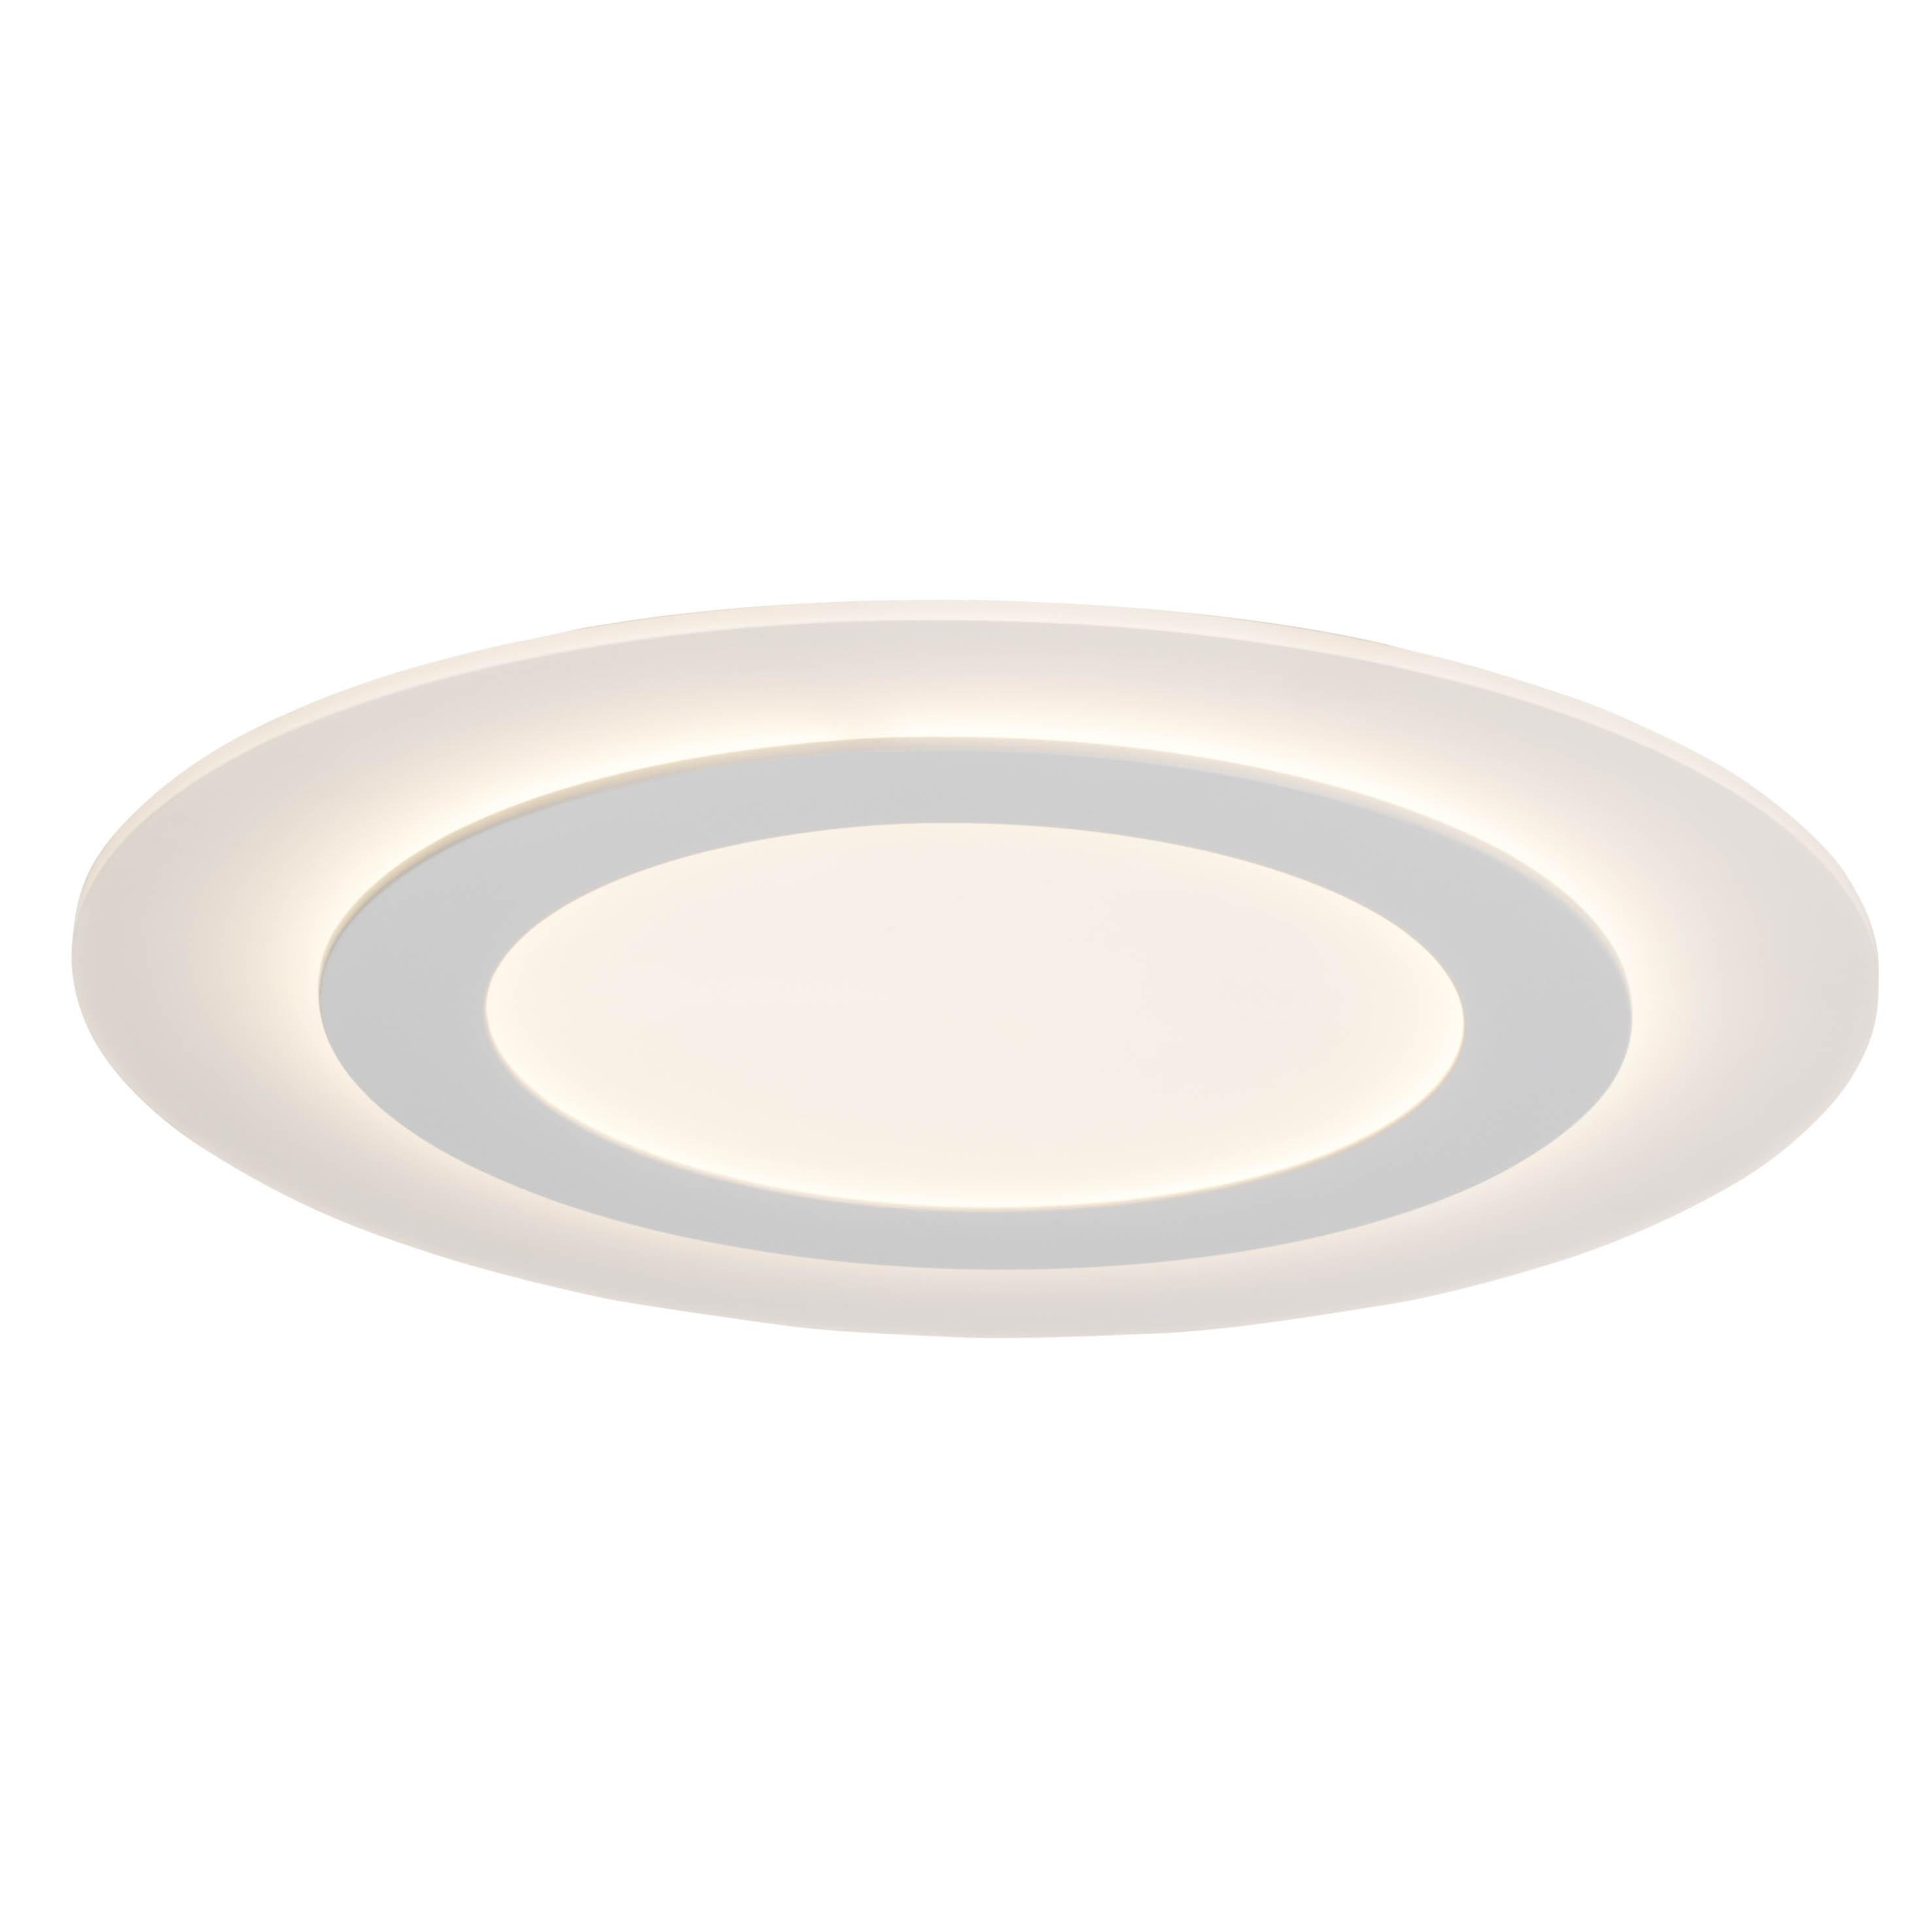 AEG Karia LED Deckenleuchte 48cm weiß